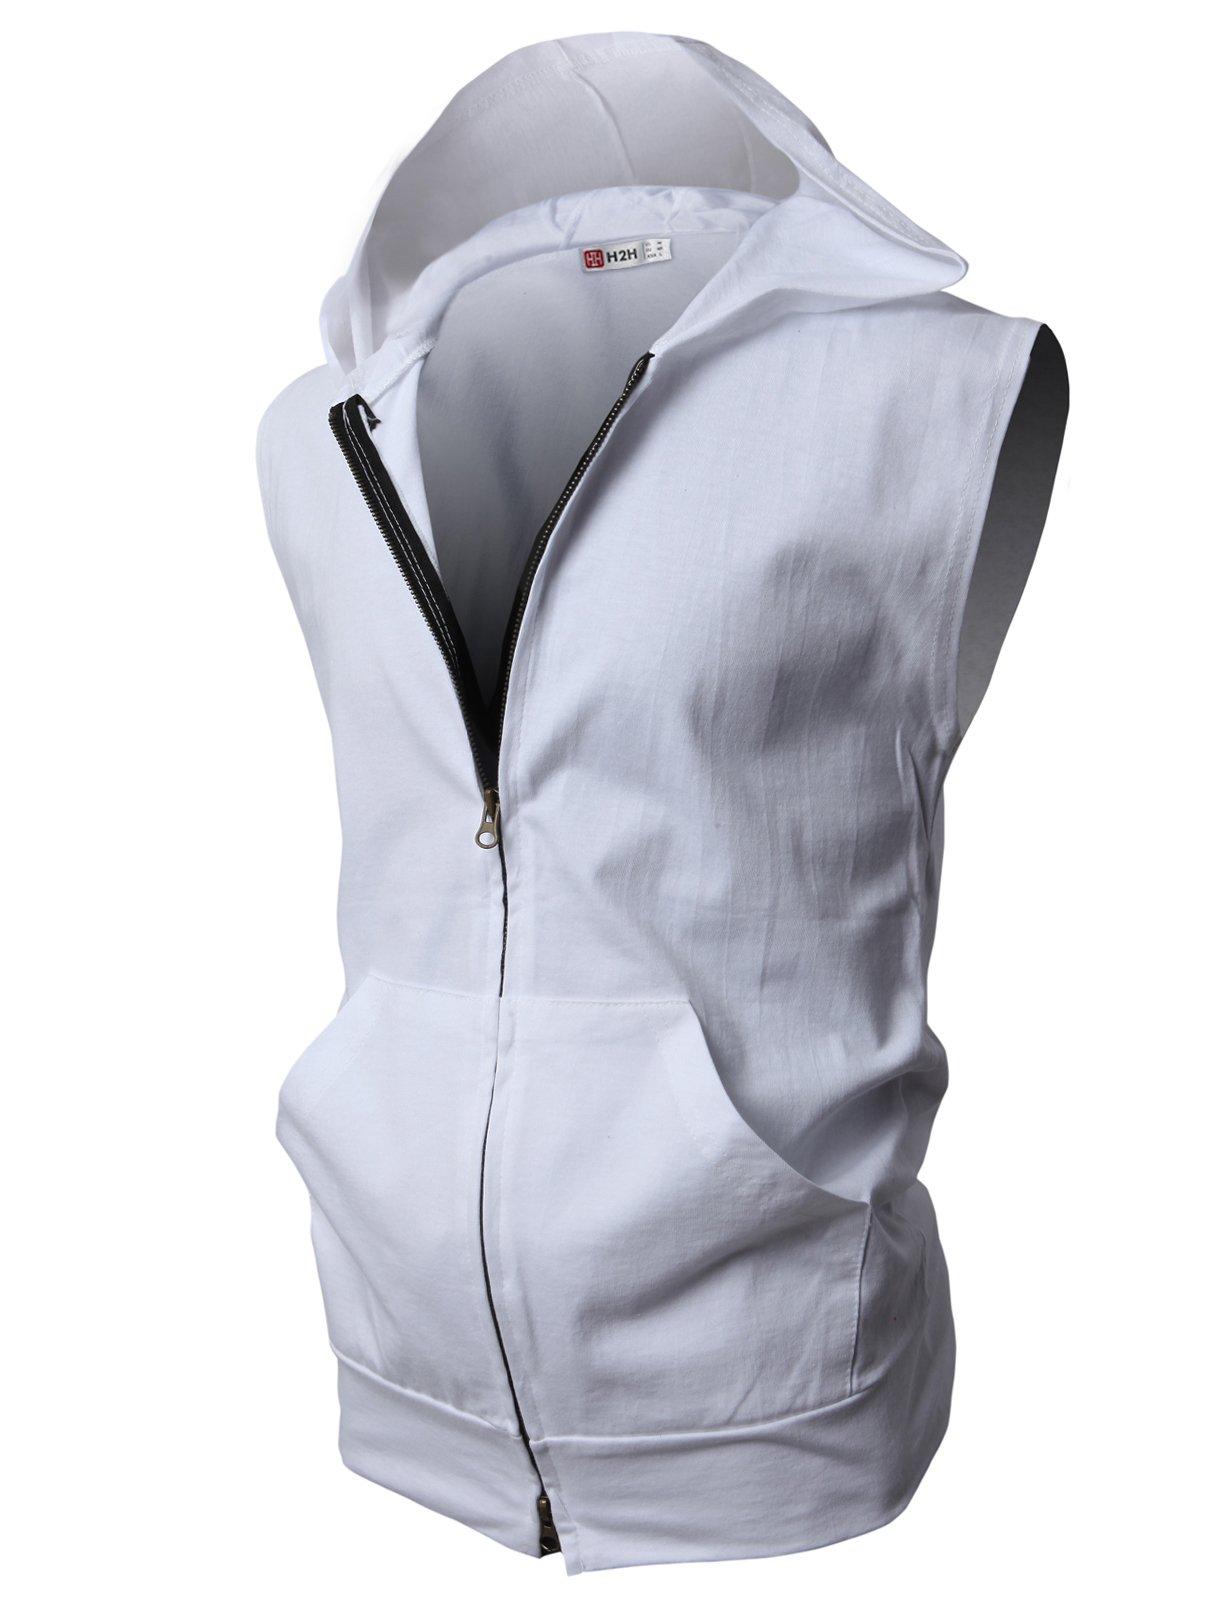 H2H Men's Casual Hooded Sleeveless Tank Tops Cotton Sleeveless T-shirts WHITE Asia XXXL (JPSK13_N25)